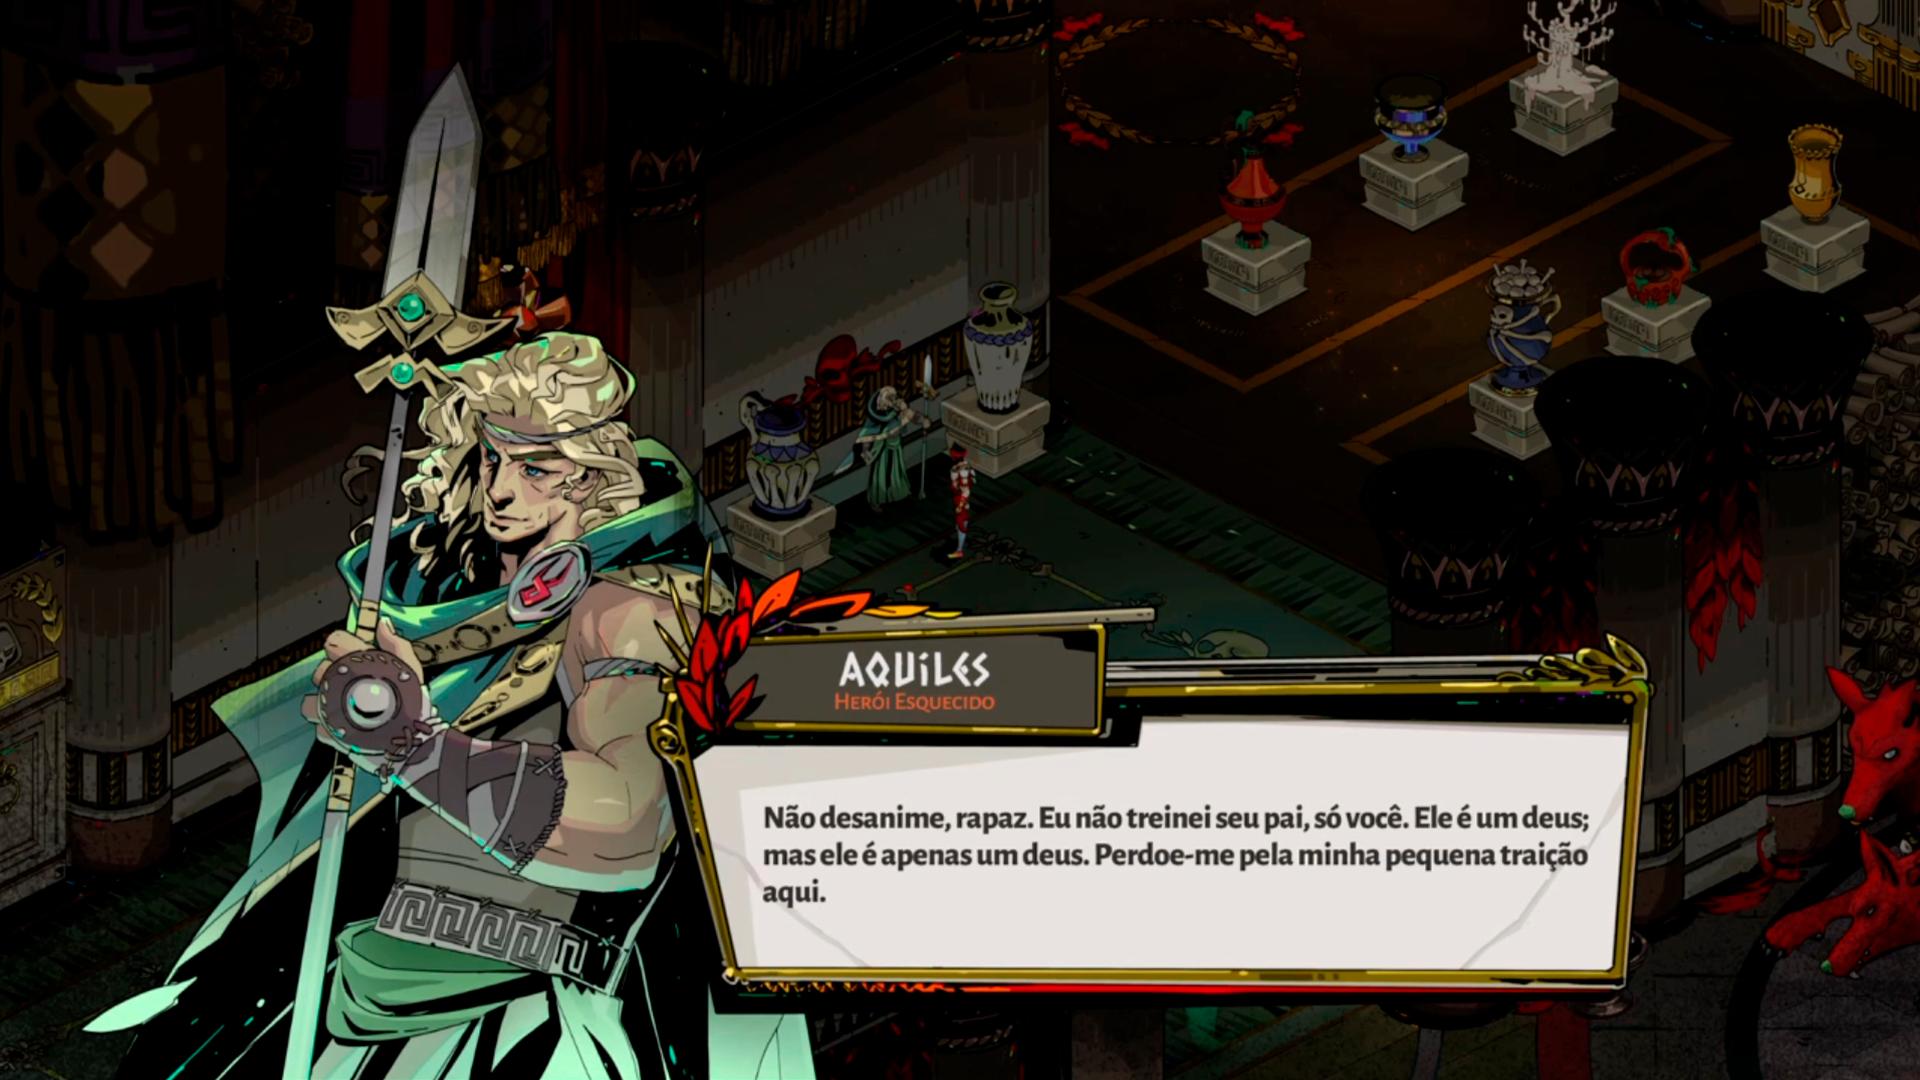 Achilles talking to Zagreus about Hades' power.